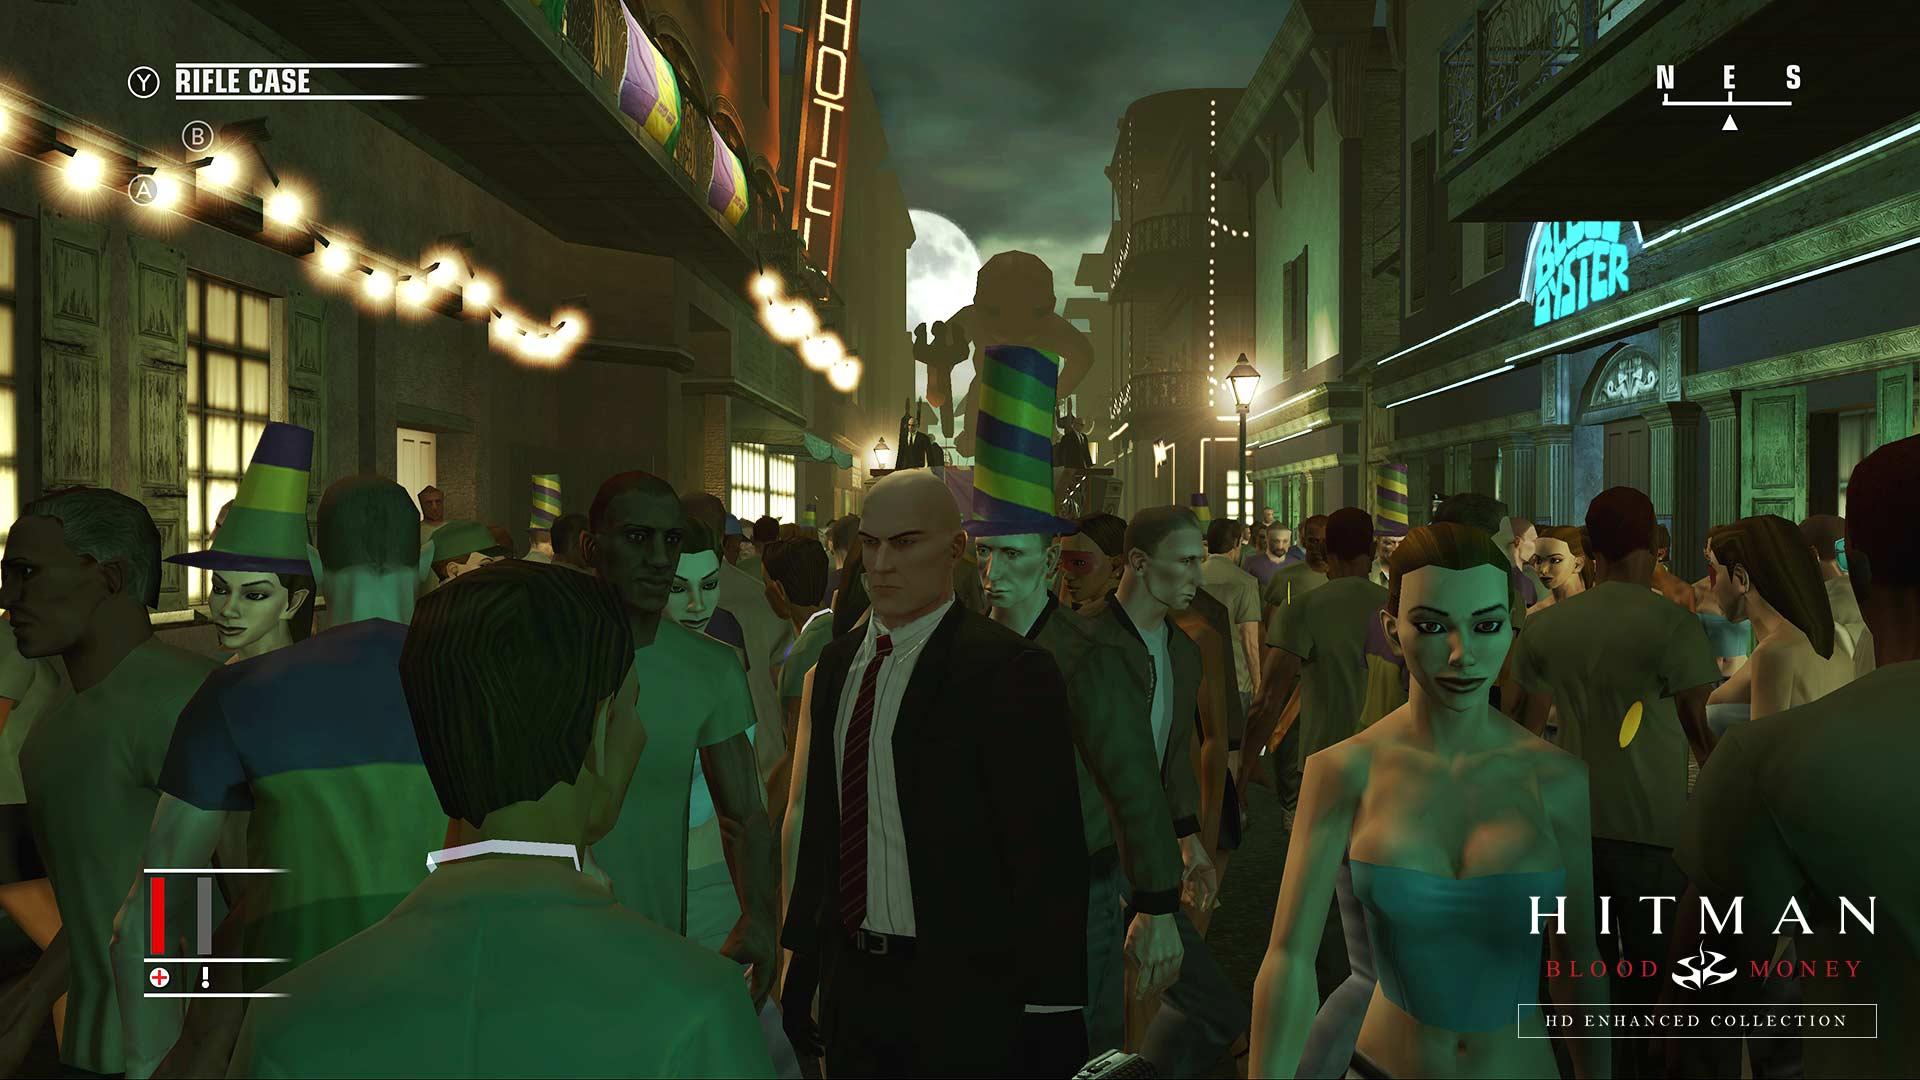 Hitman Blood Money Hd Missions List Of Levels Locations Gamerheadquarters